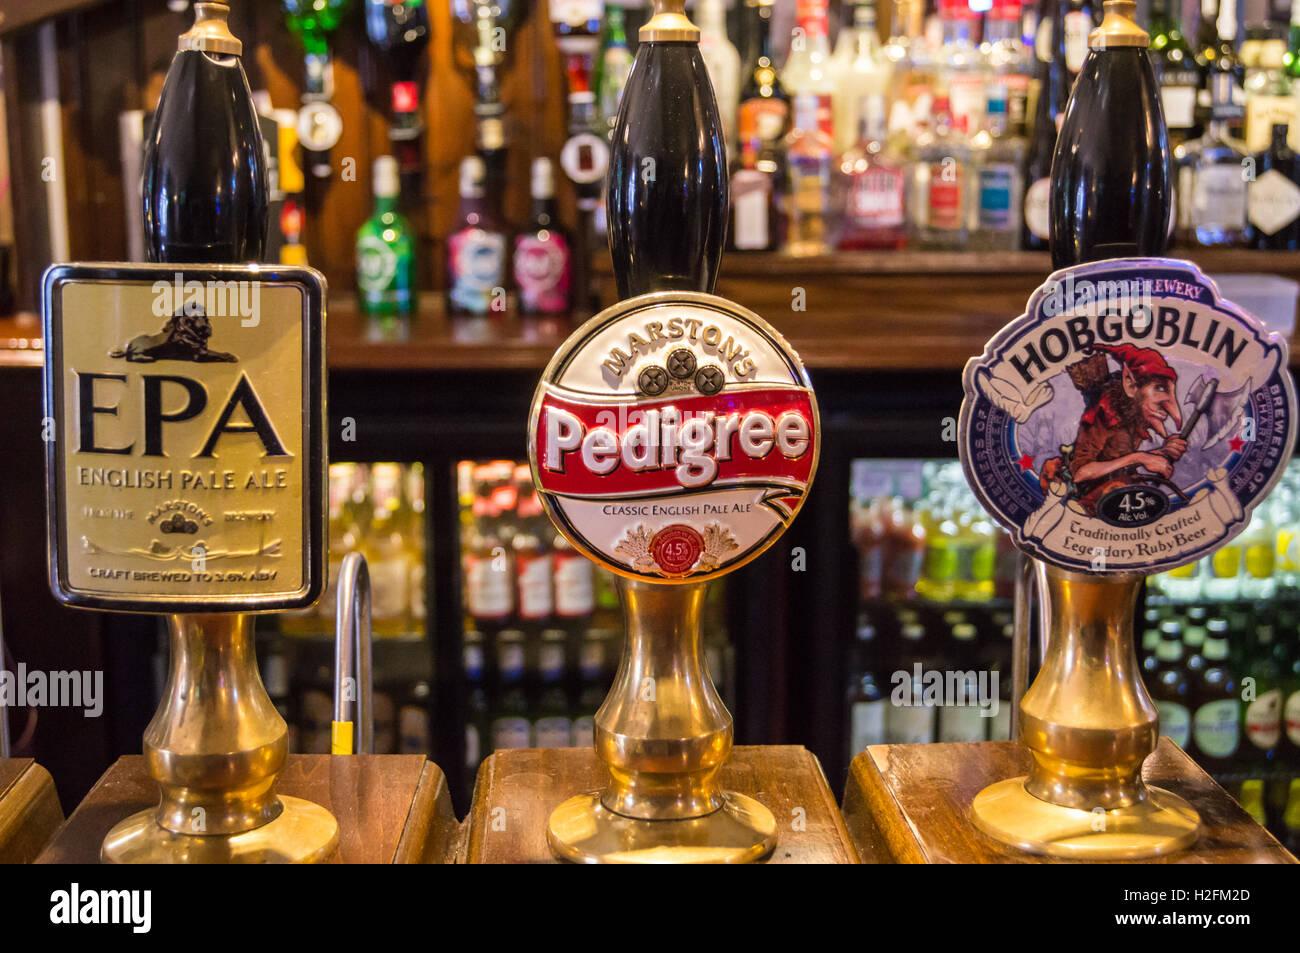 pump-clips-for-marstons-pedigree-epa-and-wychwood-hobgoblin-on-a-bar-H2FM2D.jpg